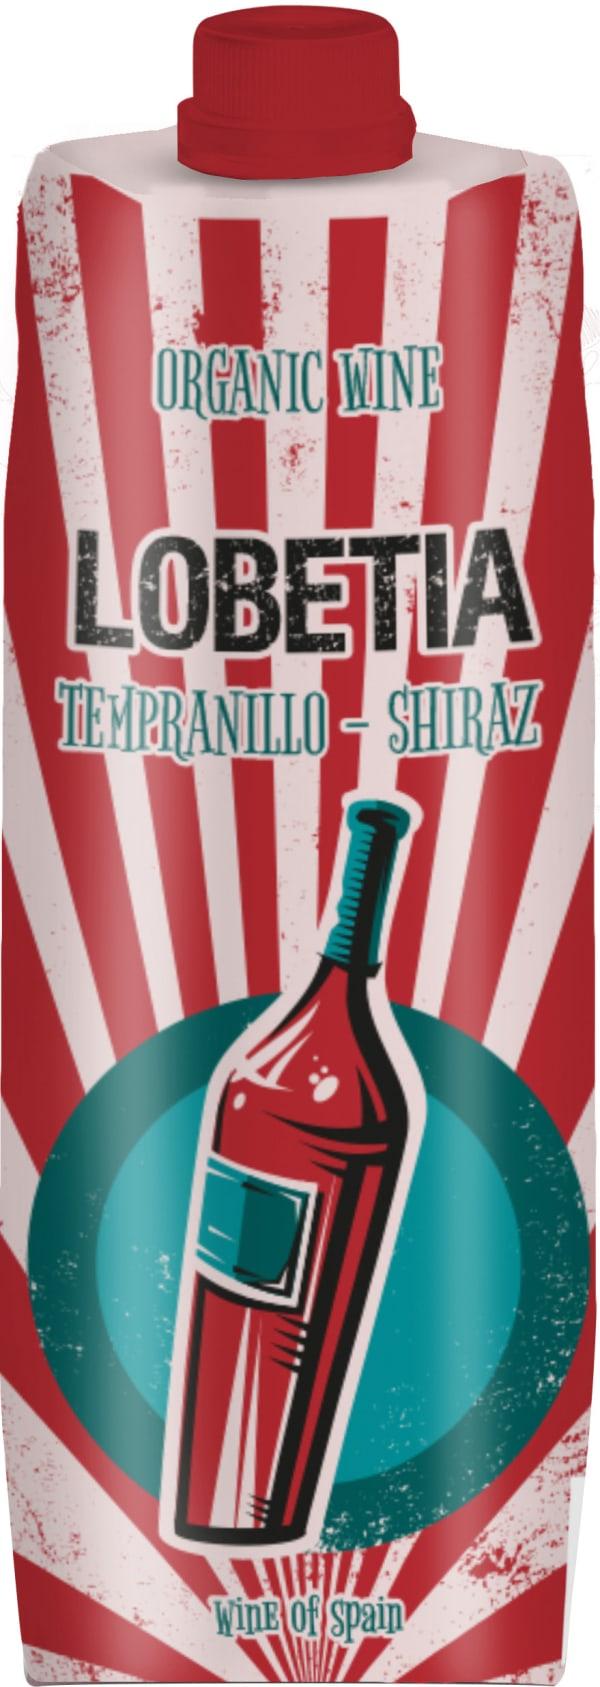 Lobetia Tempranillo Shiraz 2017 kartongförpackning